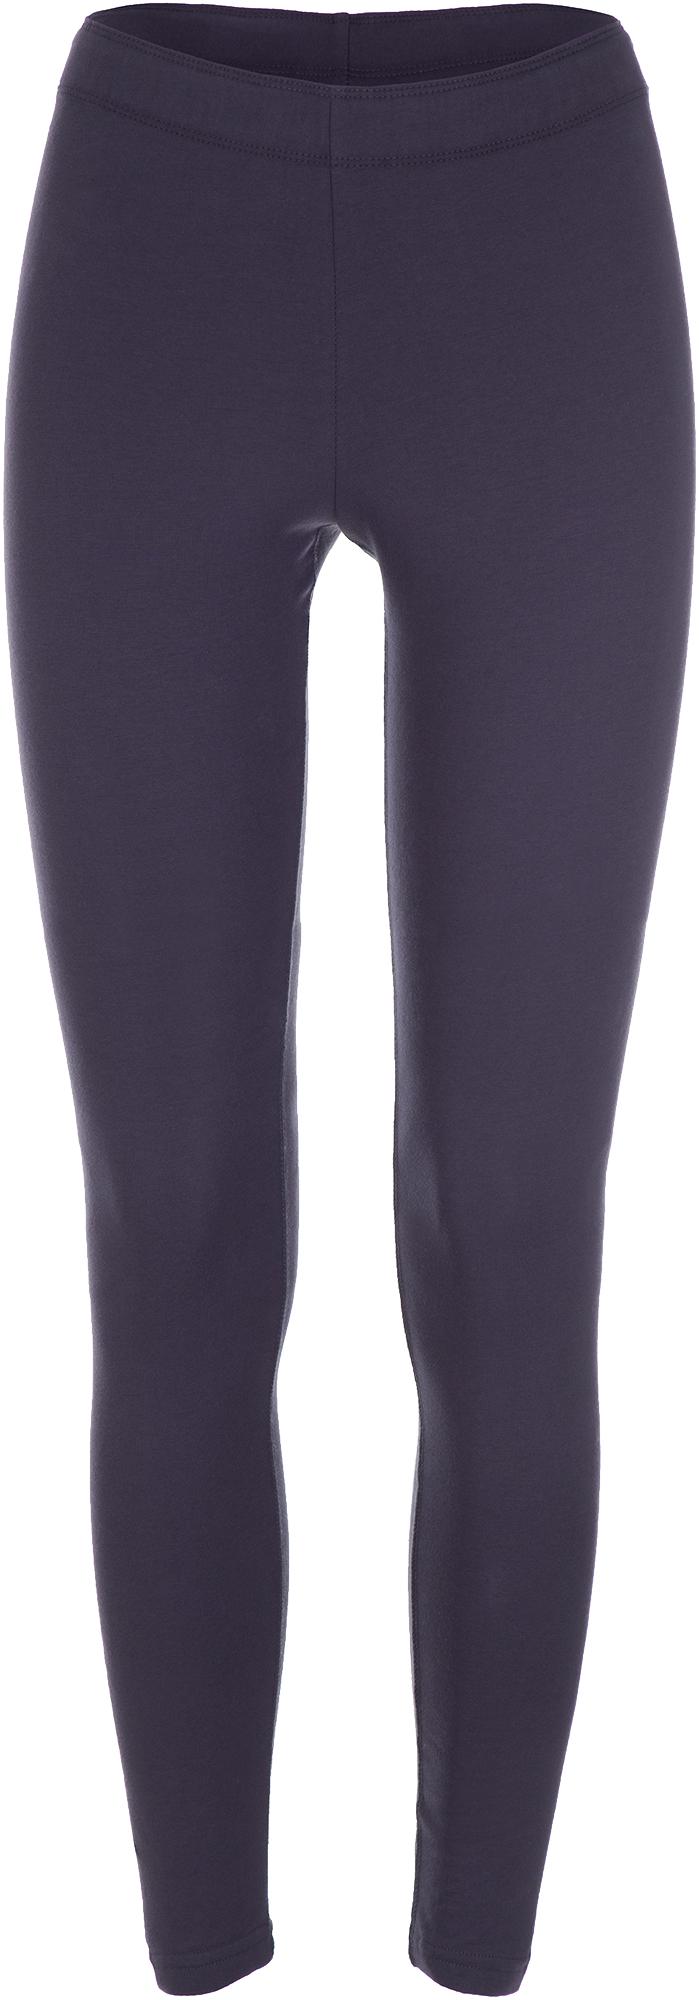 Nike Легинсы женские Nike Sportswear, размер 40-42 недорго, оригинальная цена